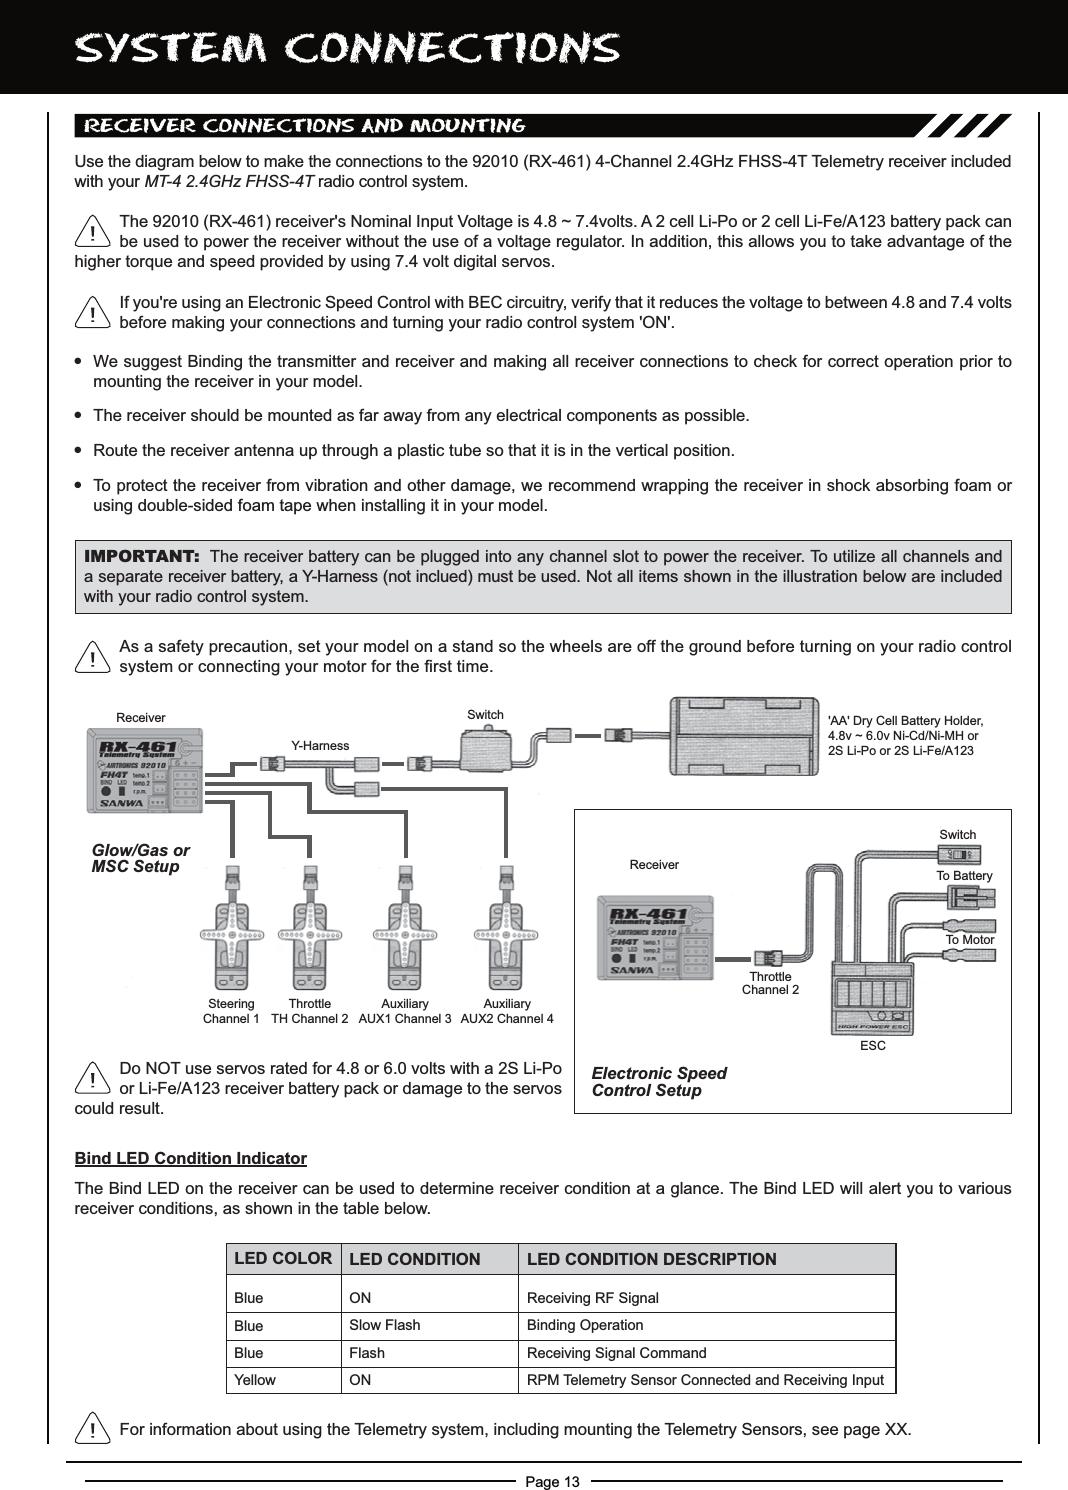 Measurement Instrumentation U0026 Controls Manual Guide